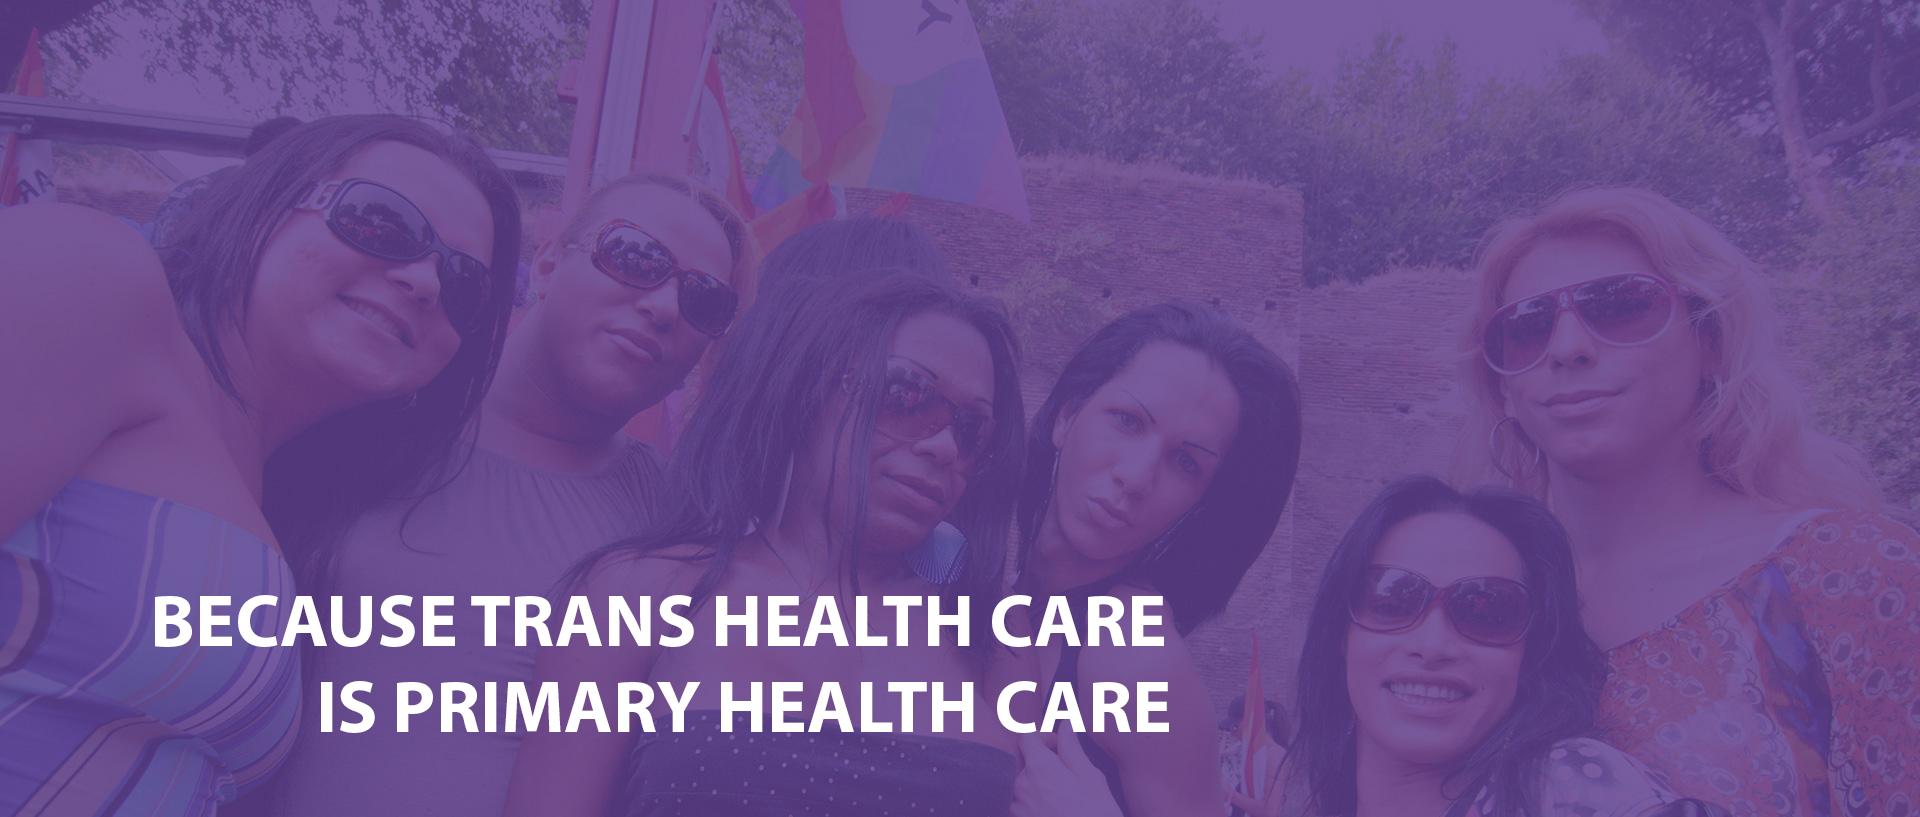 trans health care blog